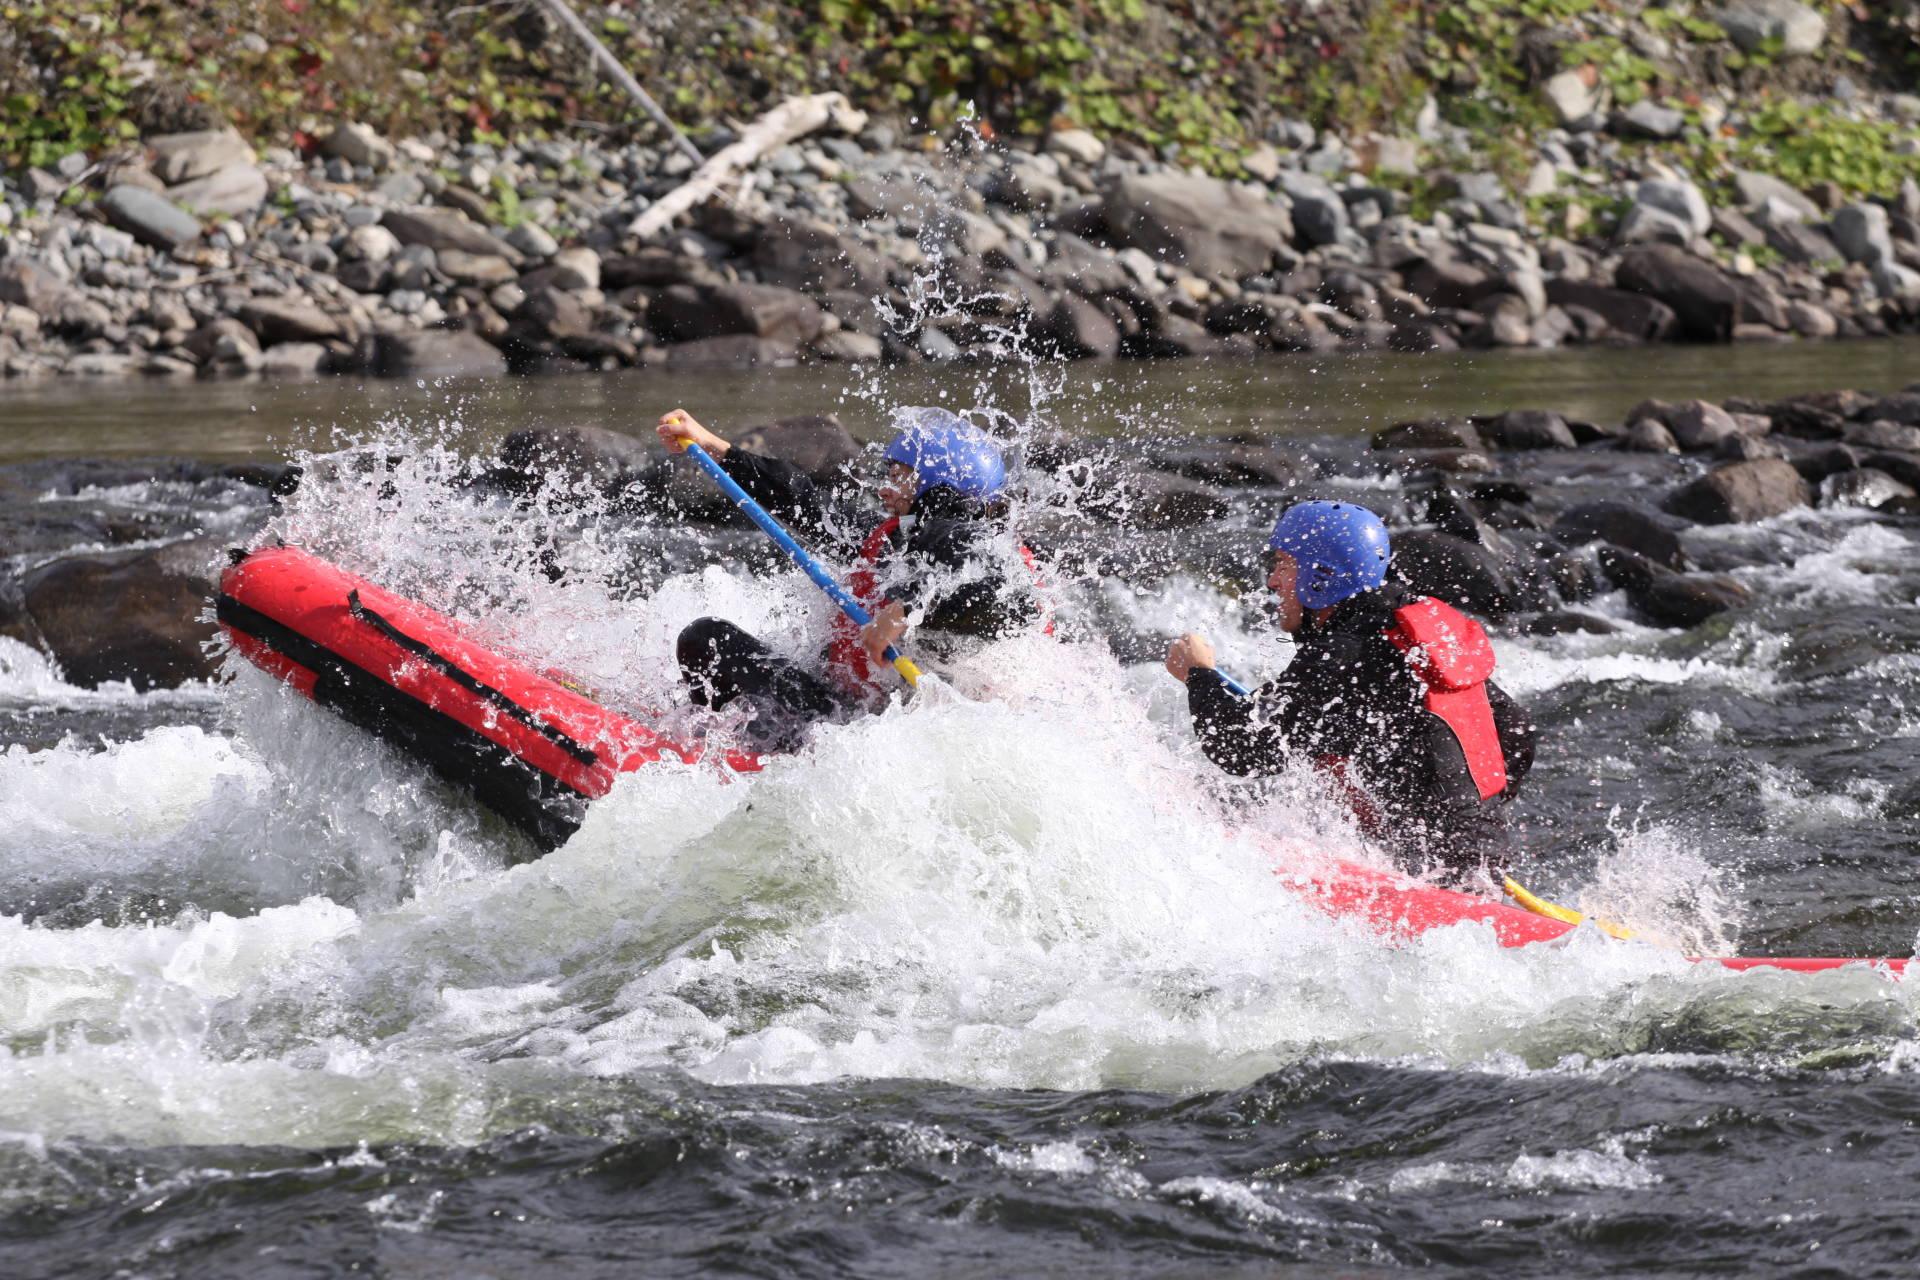 Ducky paddling i Tångböleströmmarna, Åre